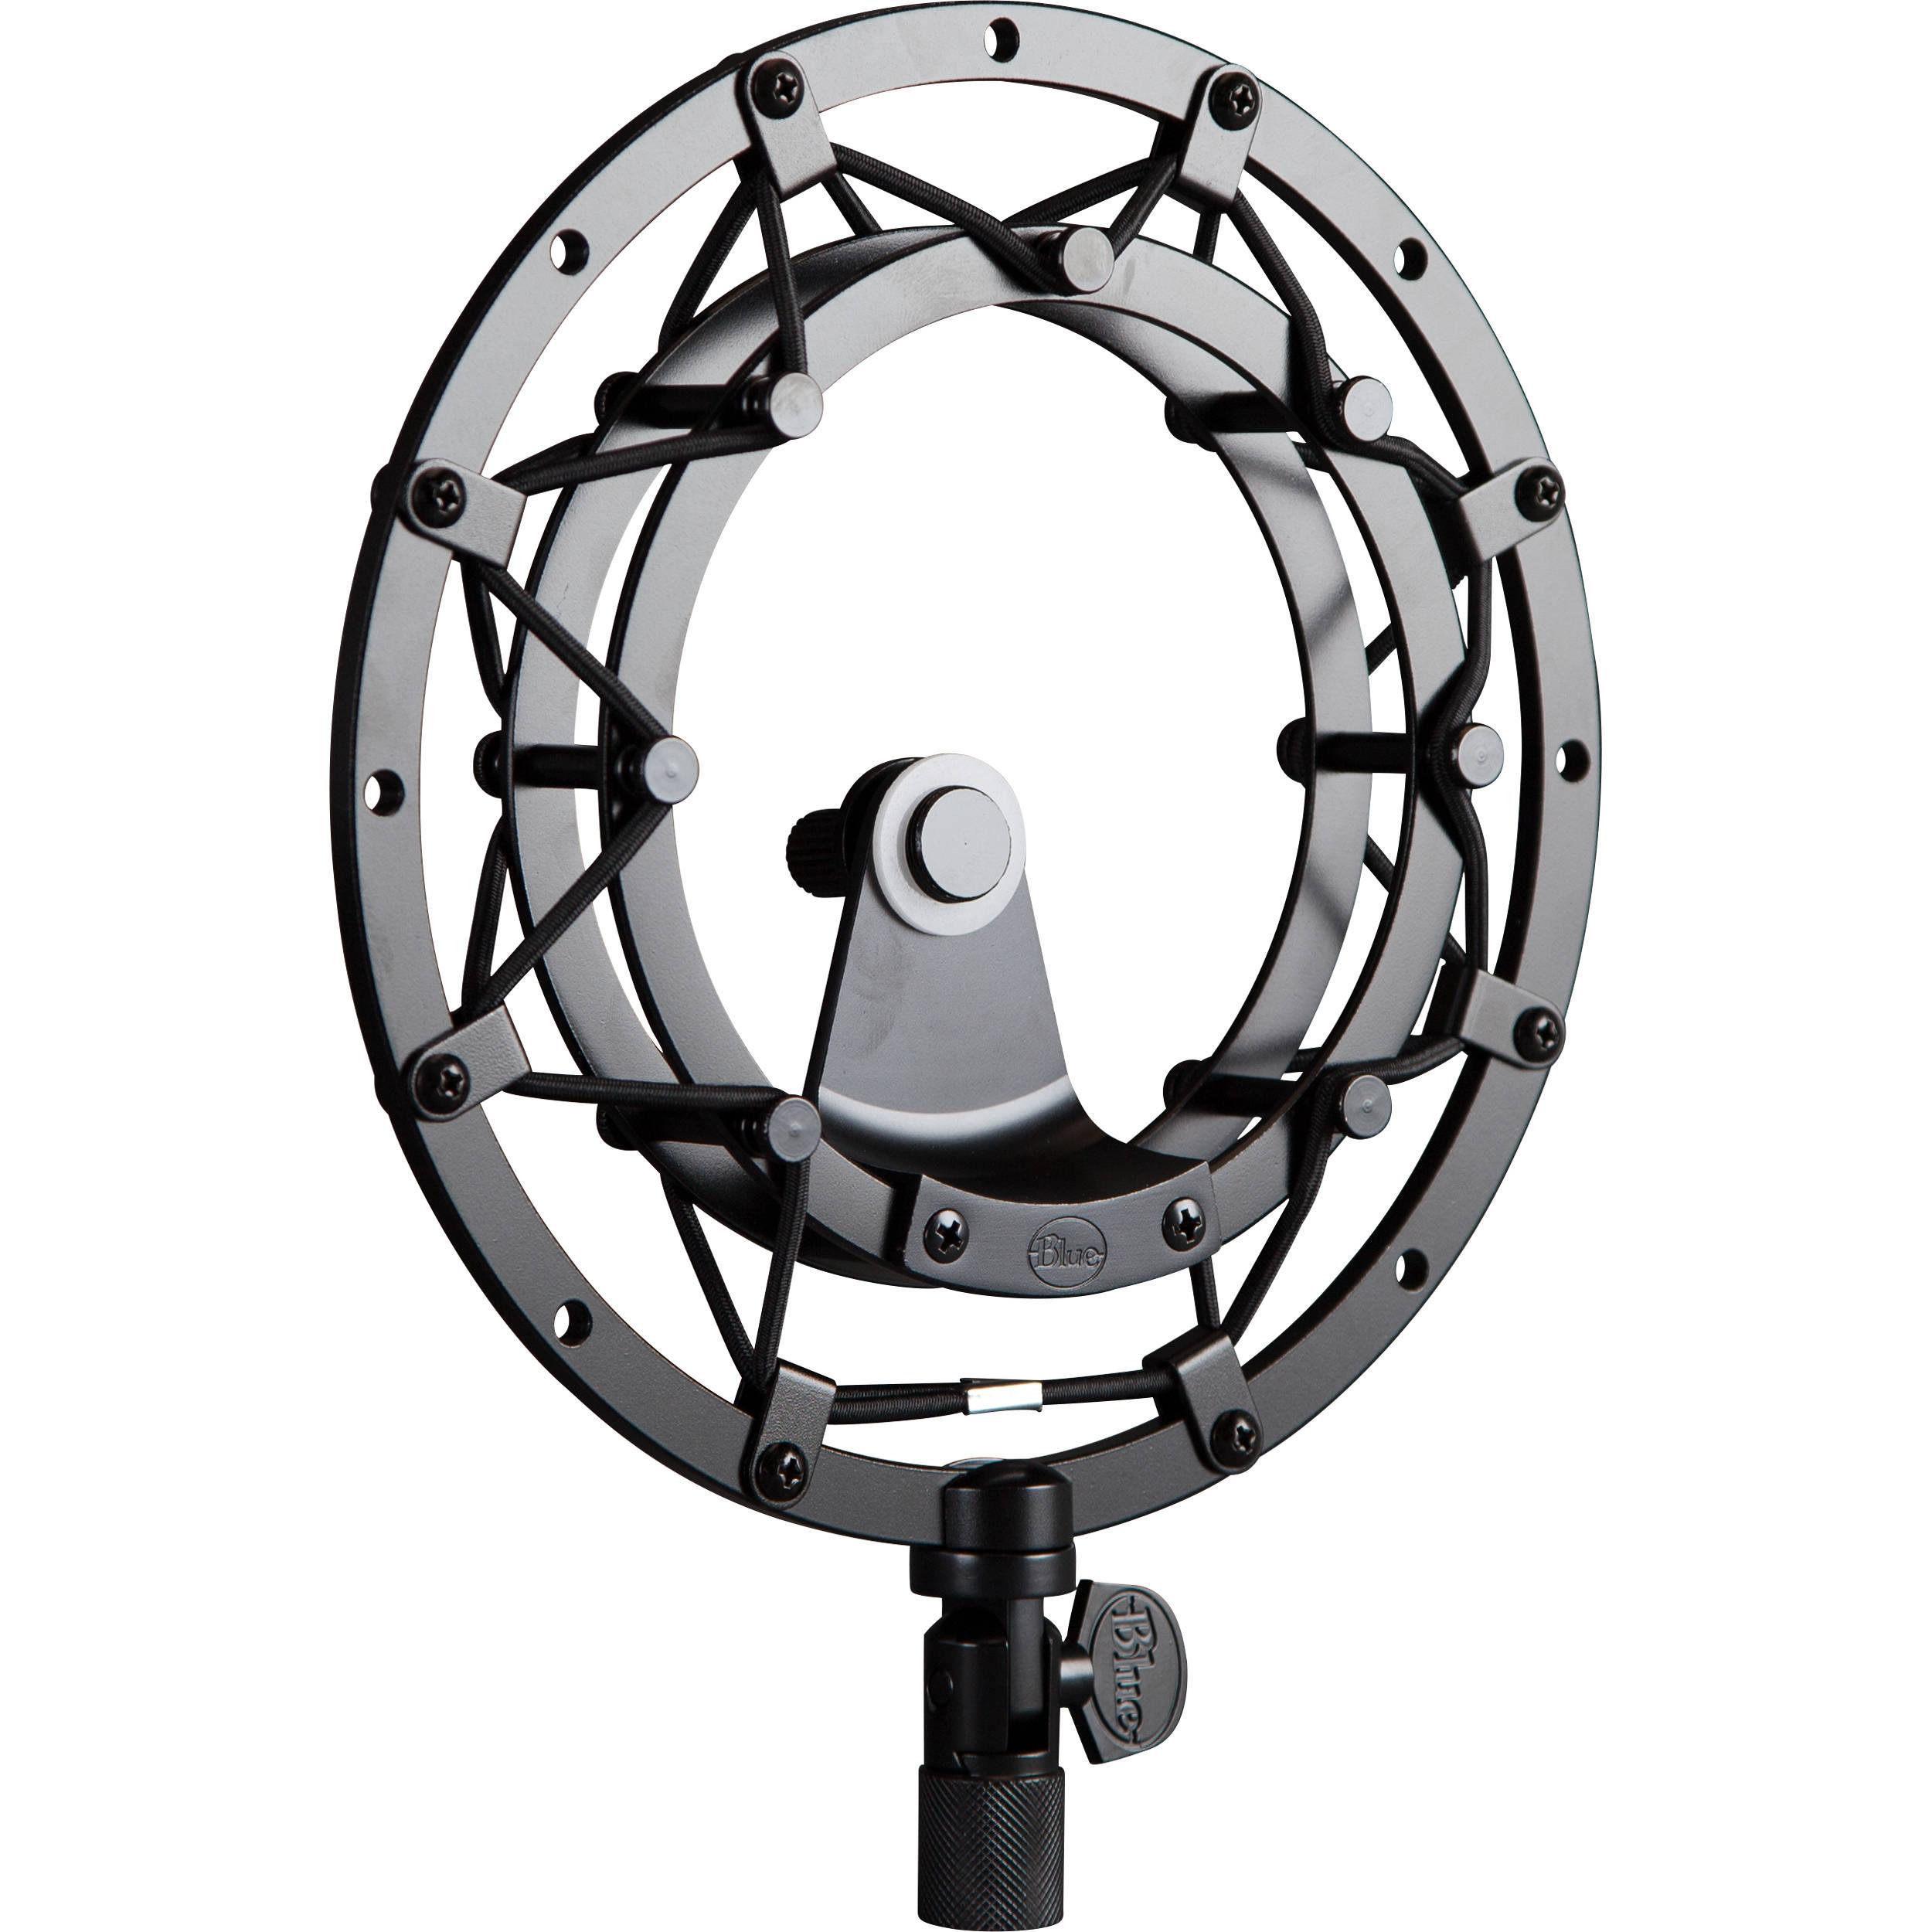 Blue radius ii blackout suspension mount for yeti yeti 1299805